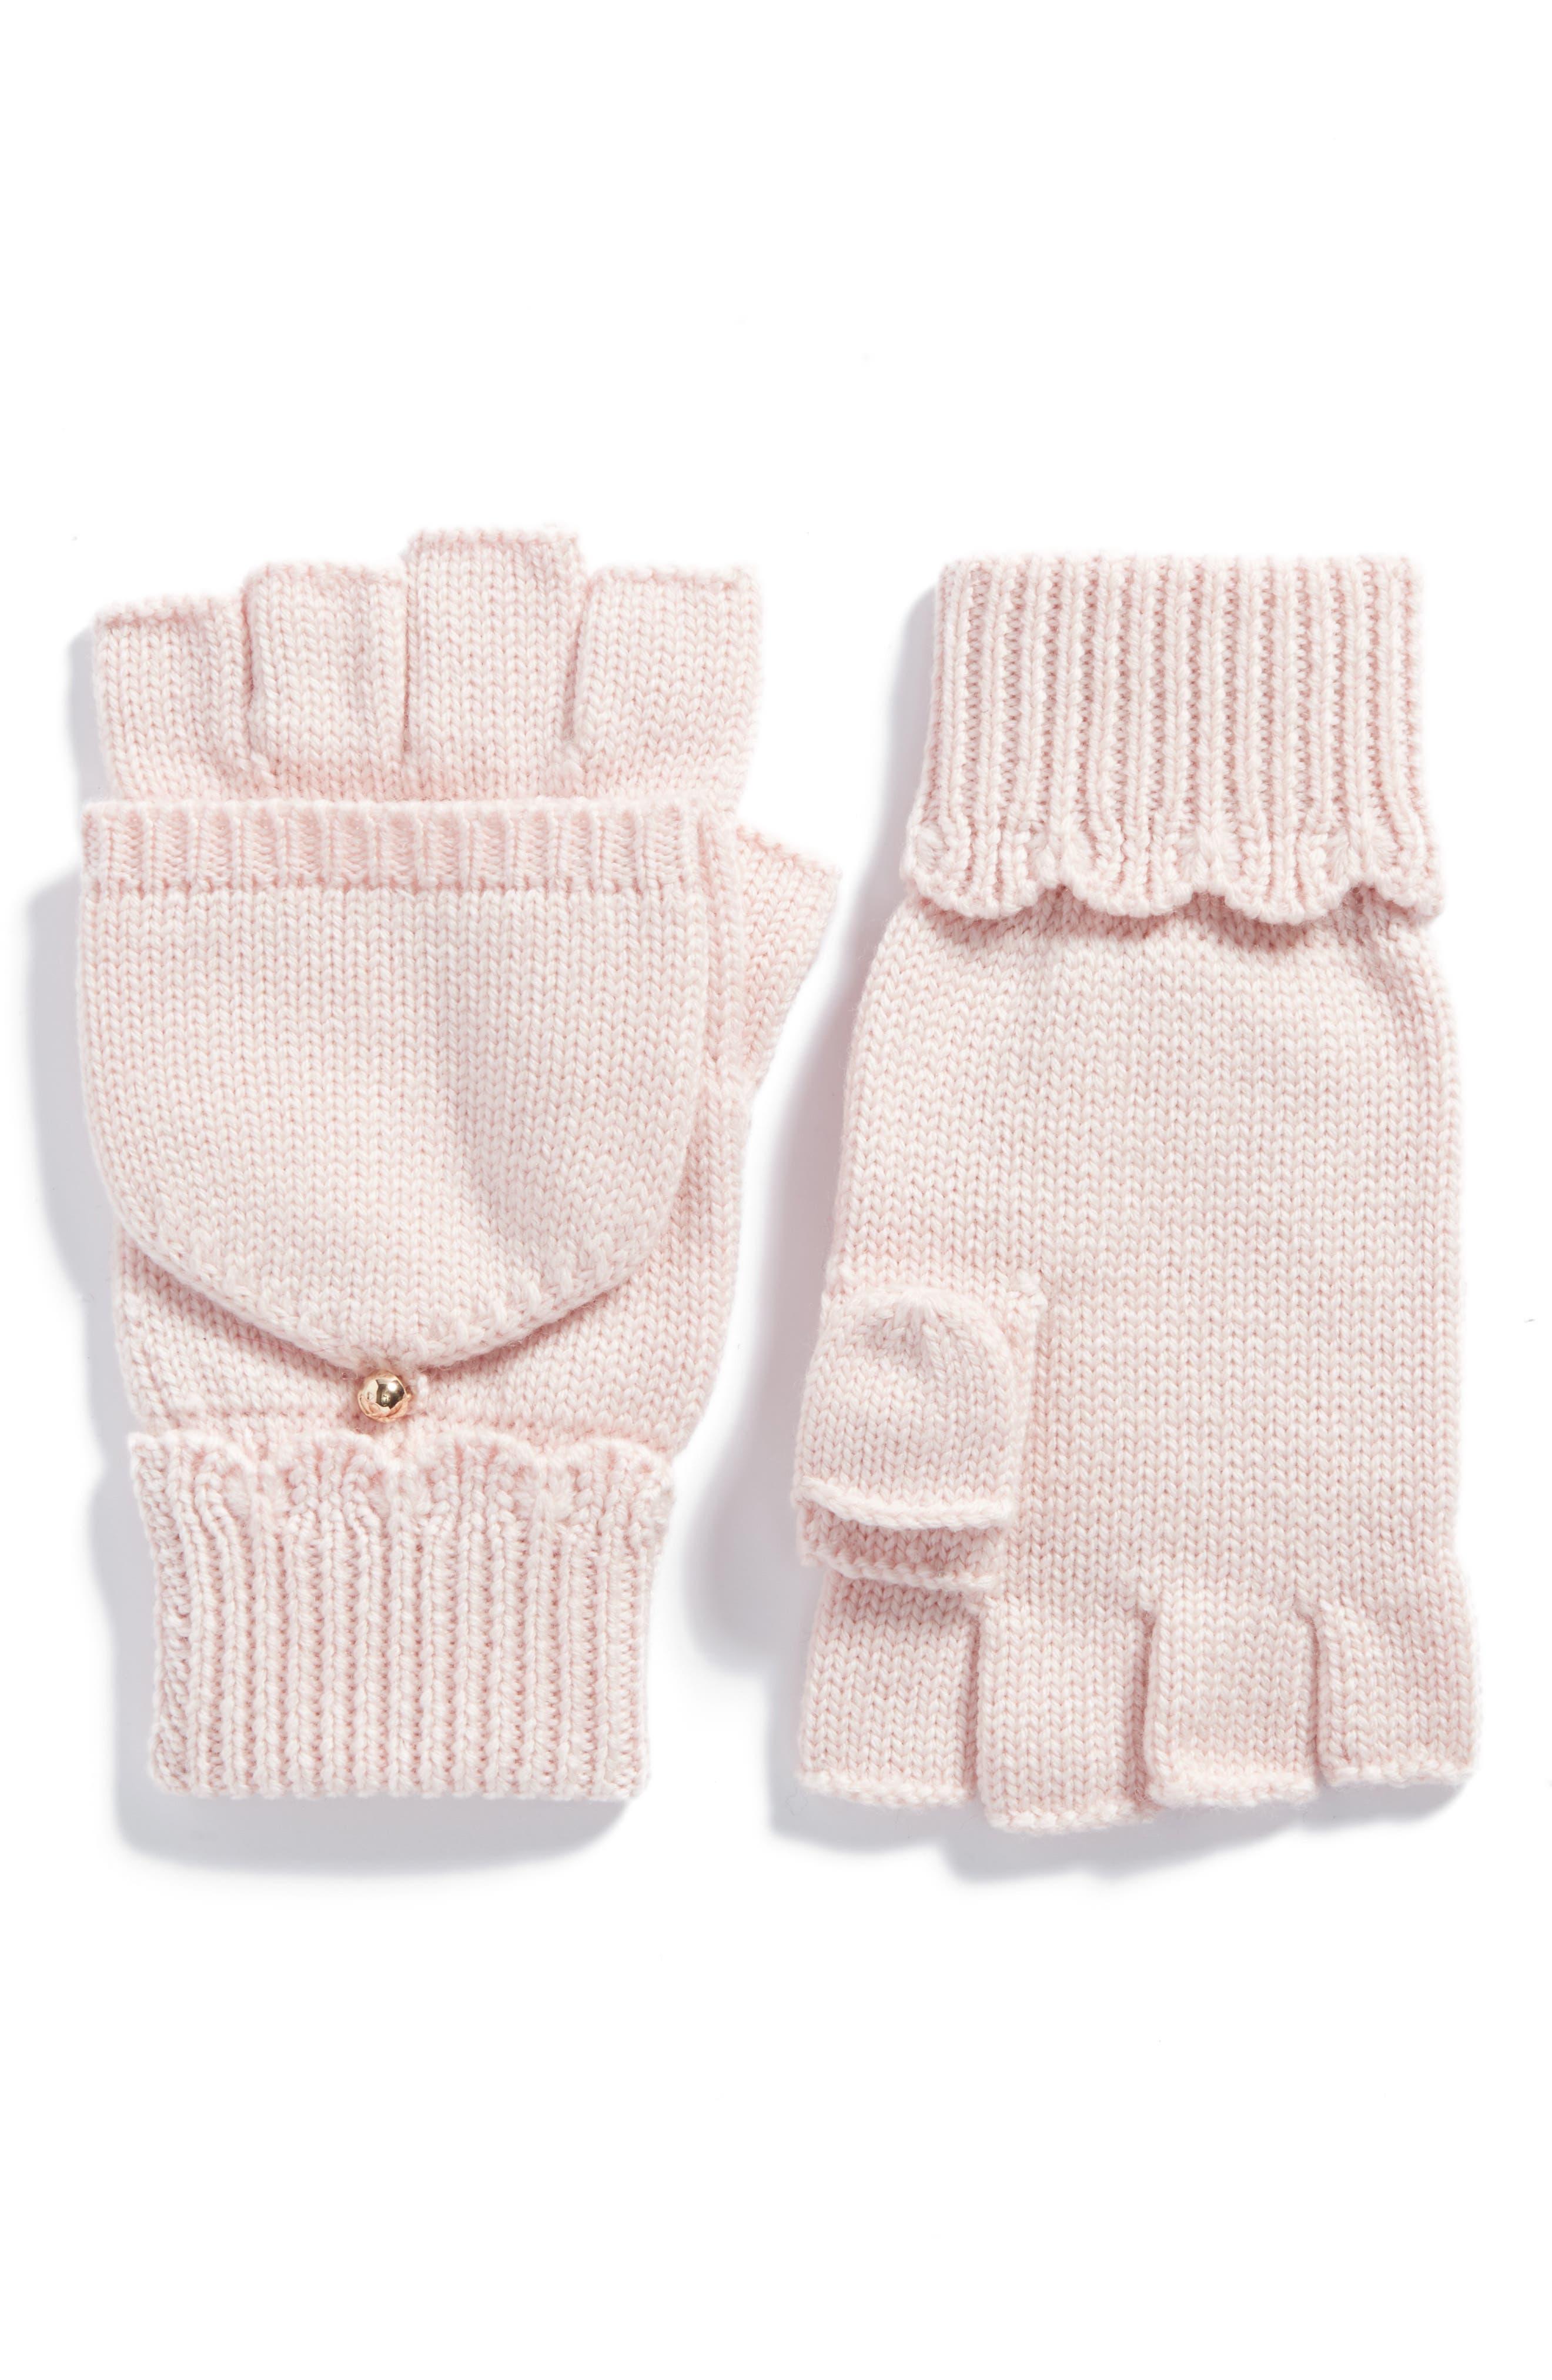 Main Image - kate spade new york scallop pop top merino wool mittens